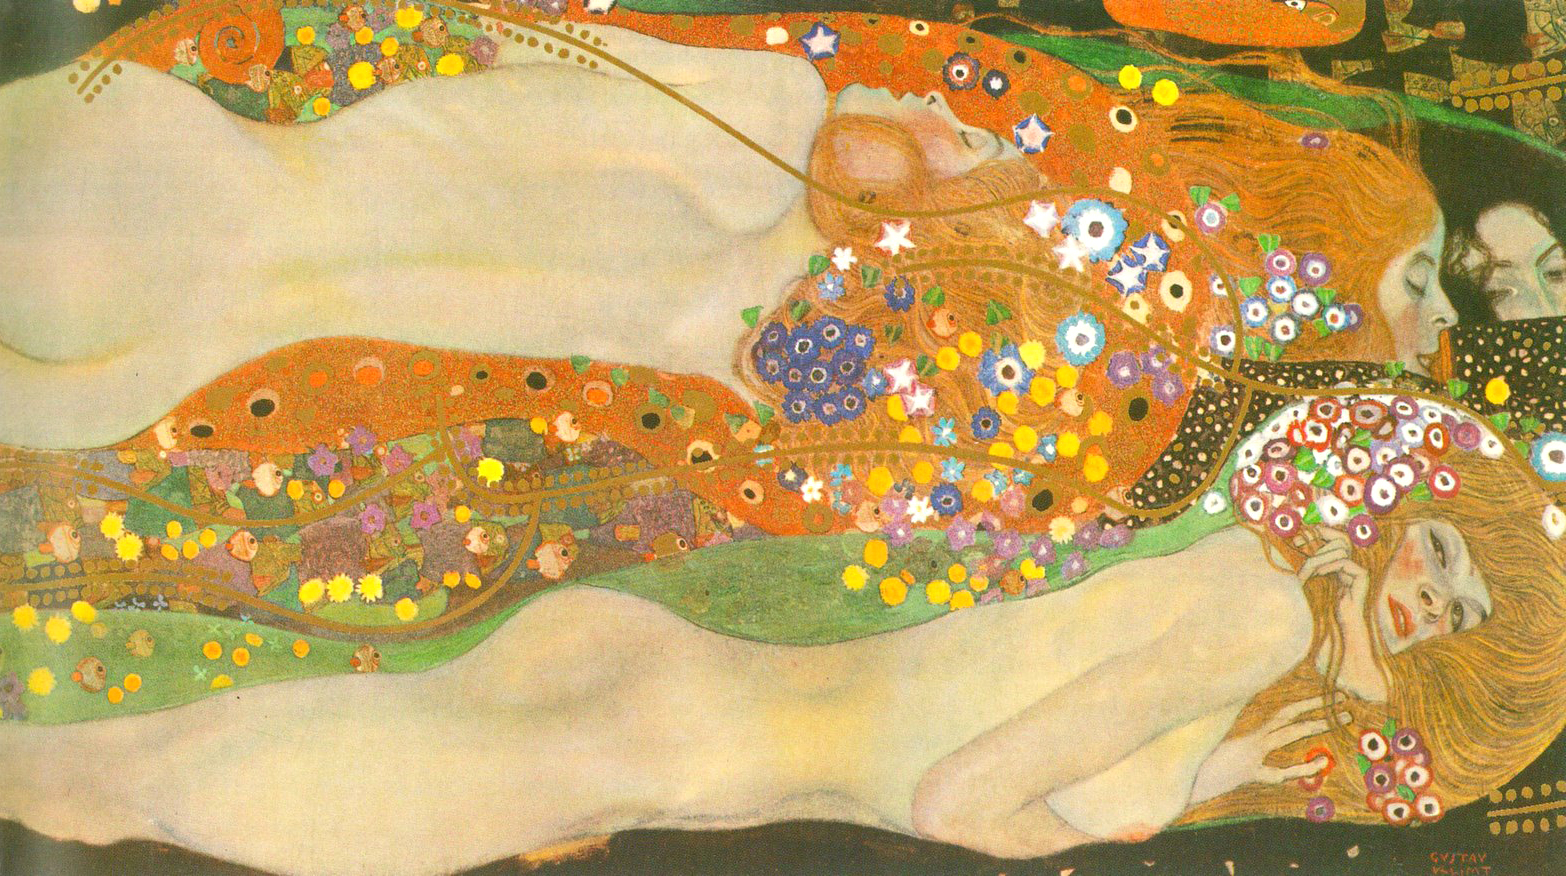 Gustav Klimt, Water Snakes II